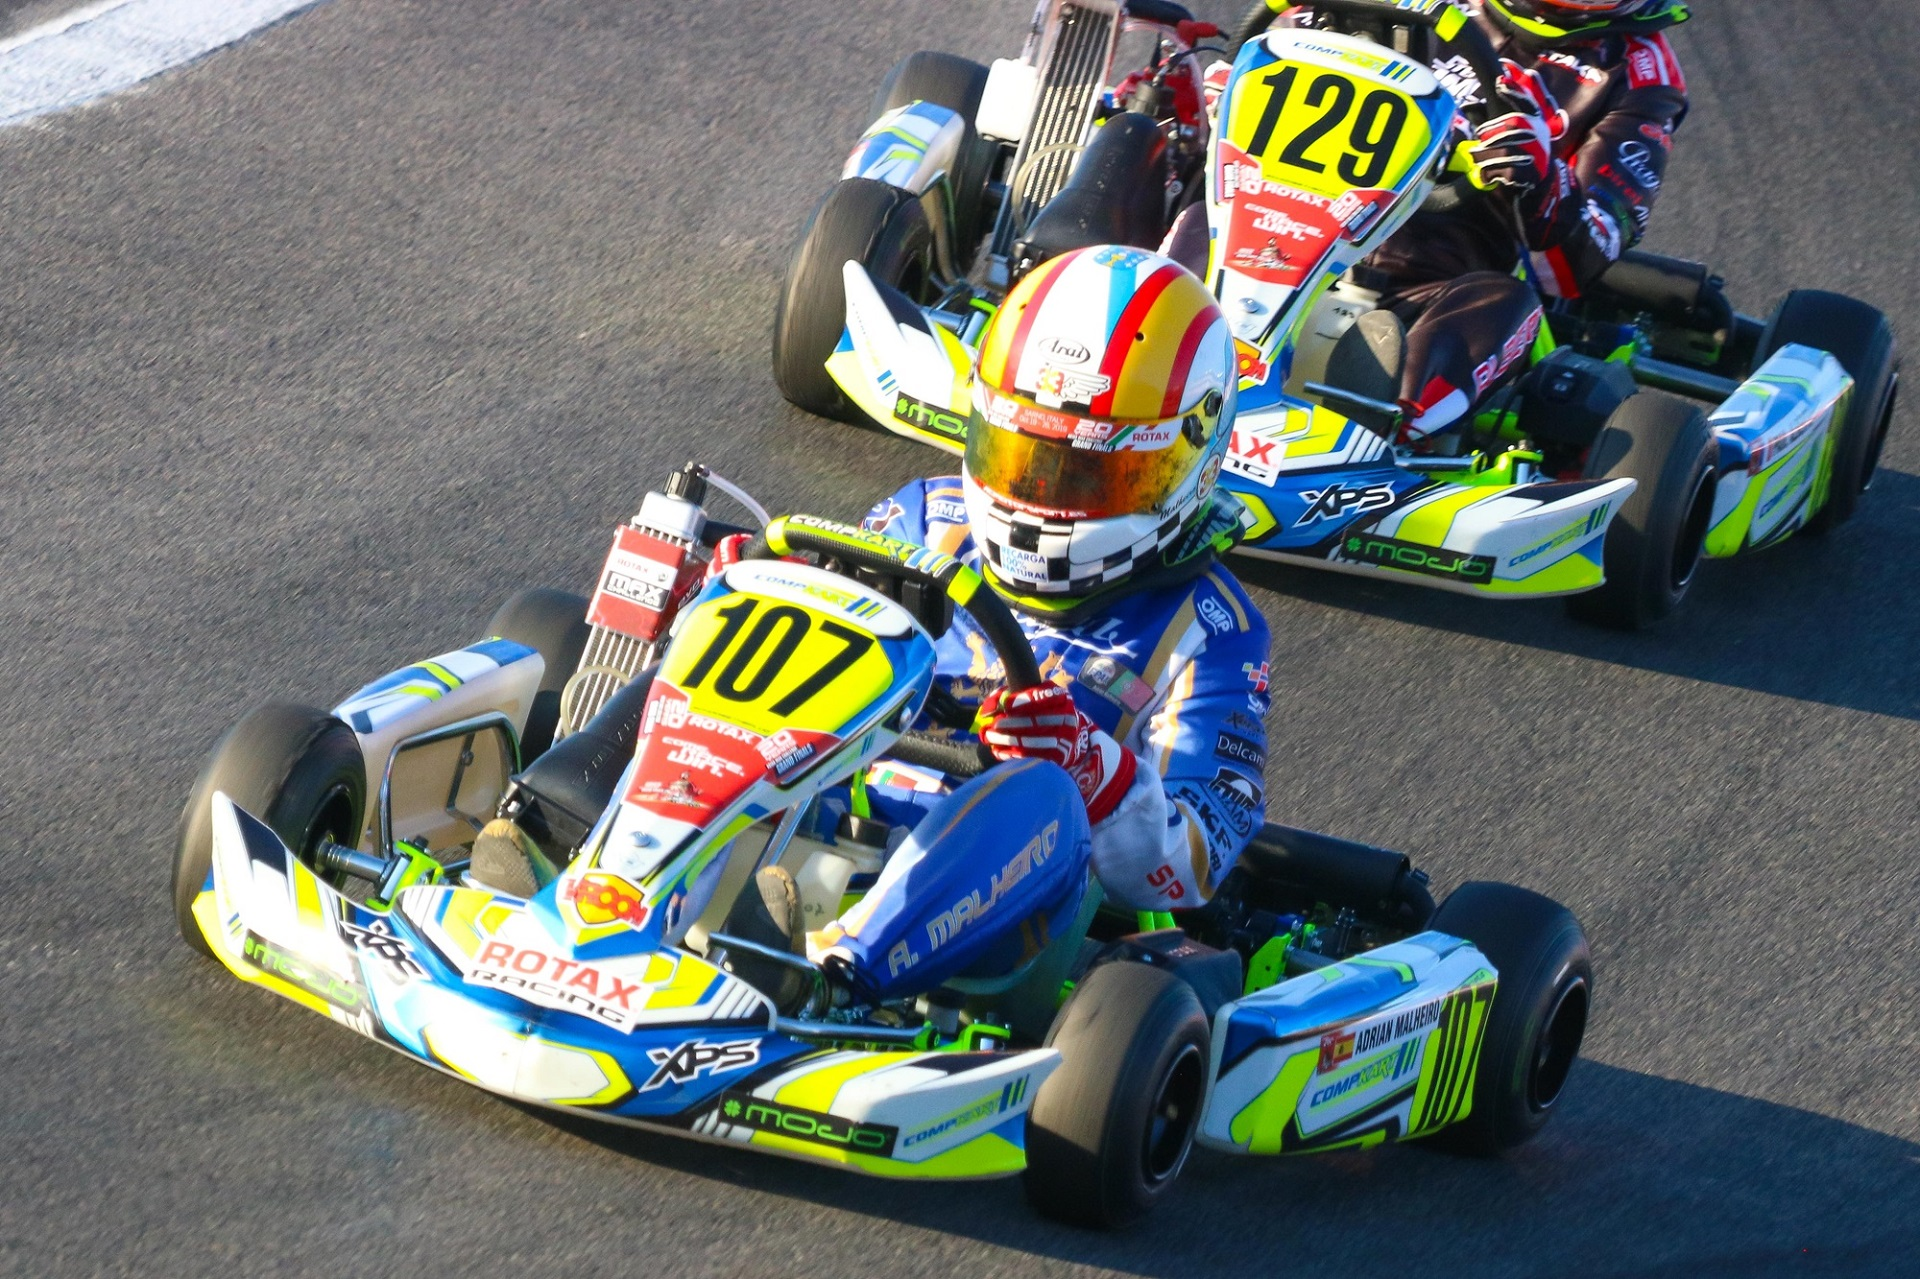 Adrián Malheiro forçado a abandonar na Final do Mundial Rotax Mini-Max